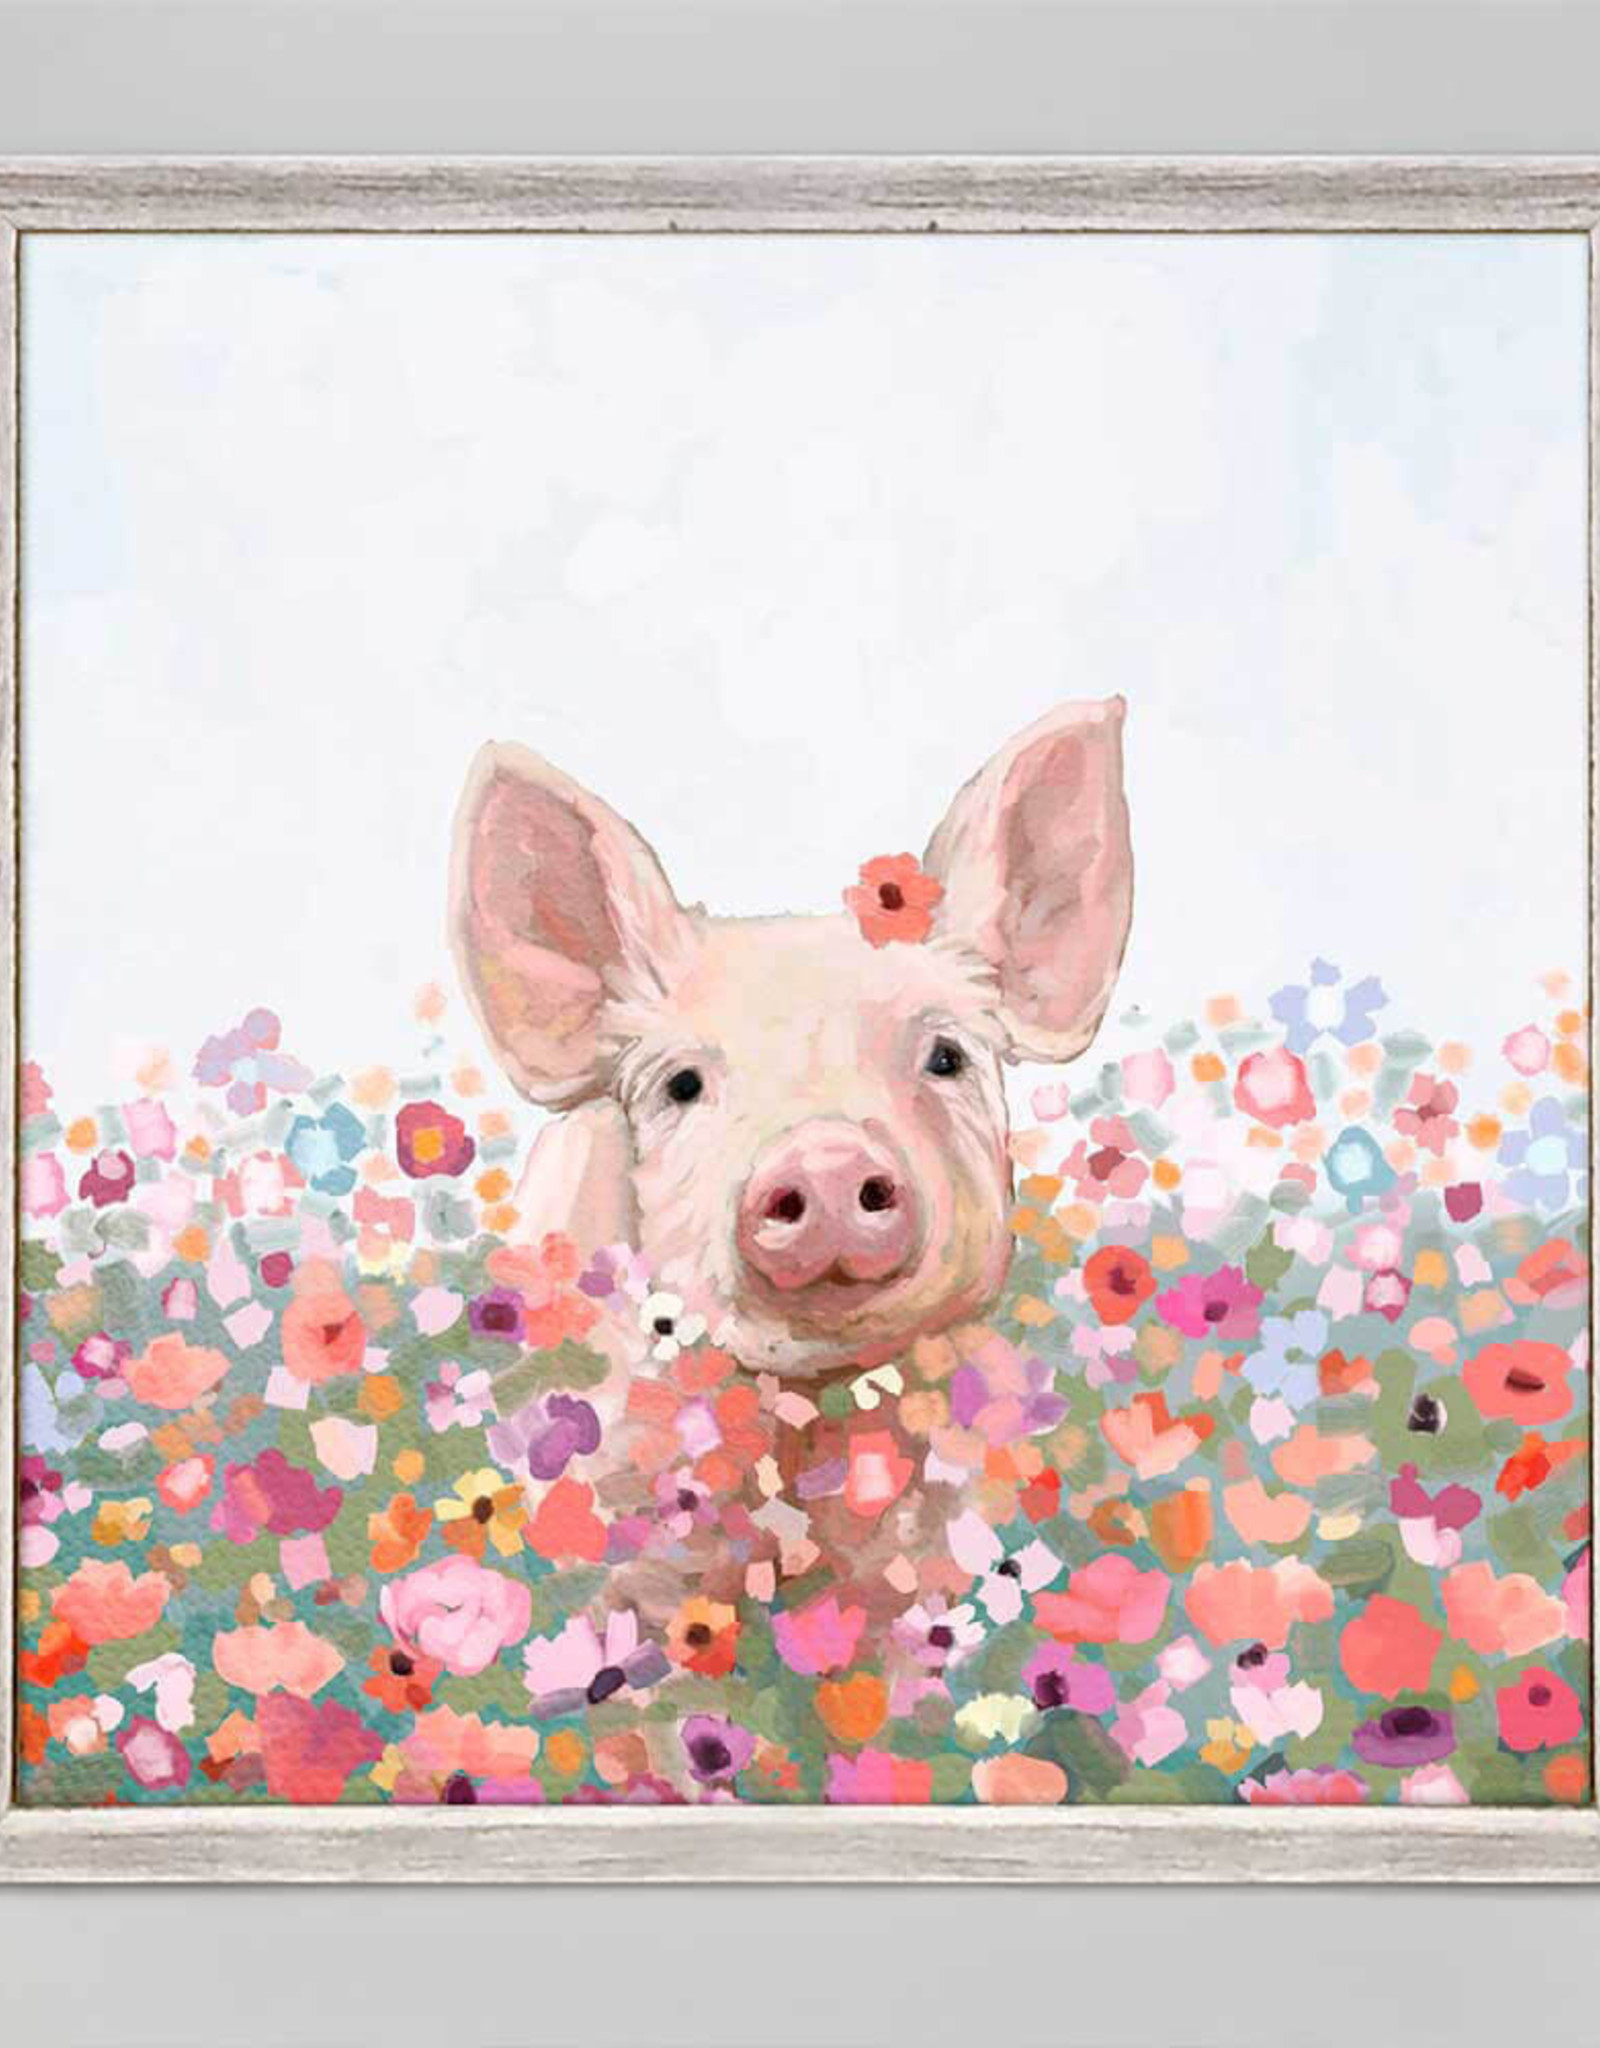 Greenbox Art Wildflower Pig Mini Framed Canvas 6 x 6